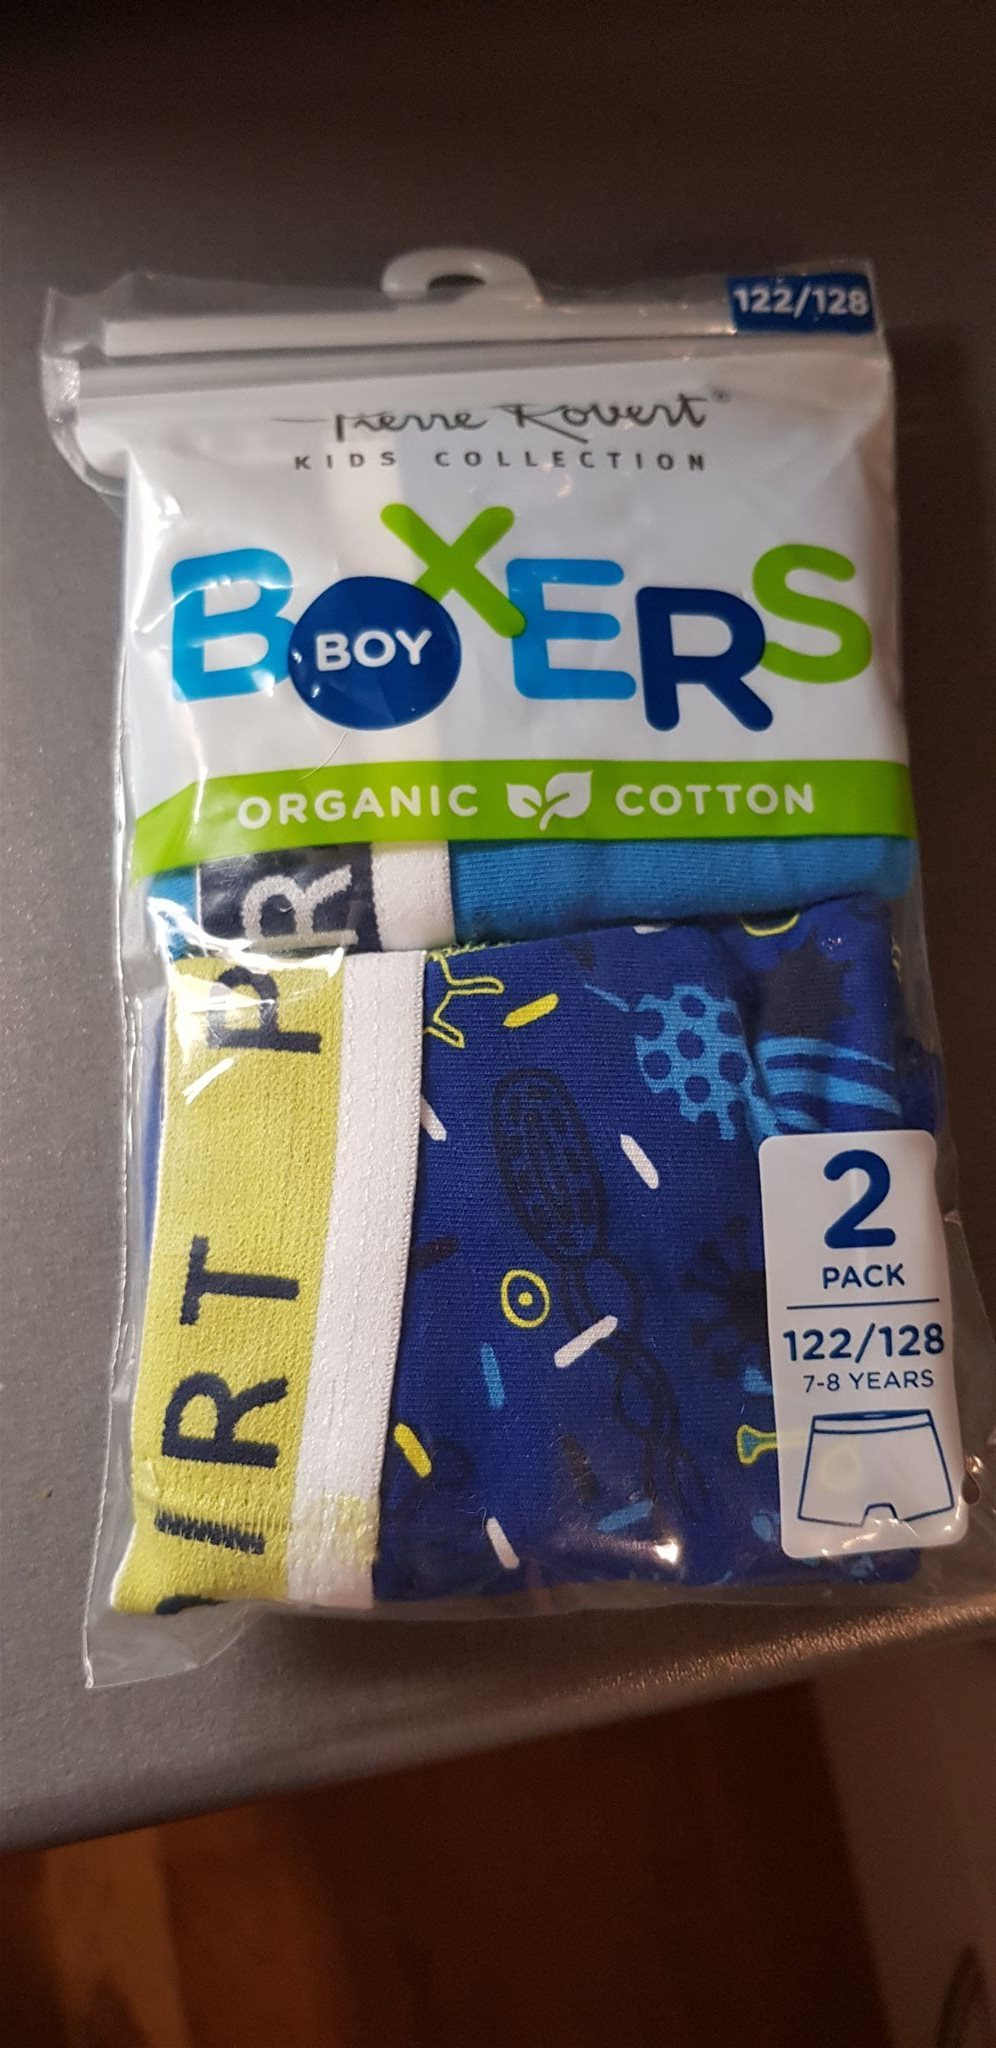 Pierre Robert Kalsonger Boy EKOLOGISK BOMULL (336053323) ᐈ Köp på ... 5baa0280a1844